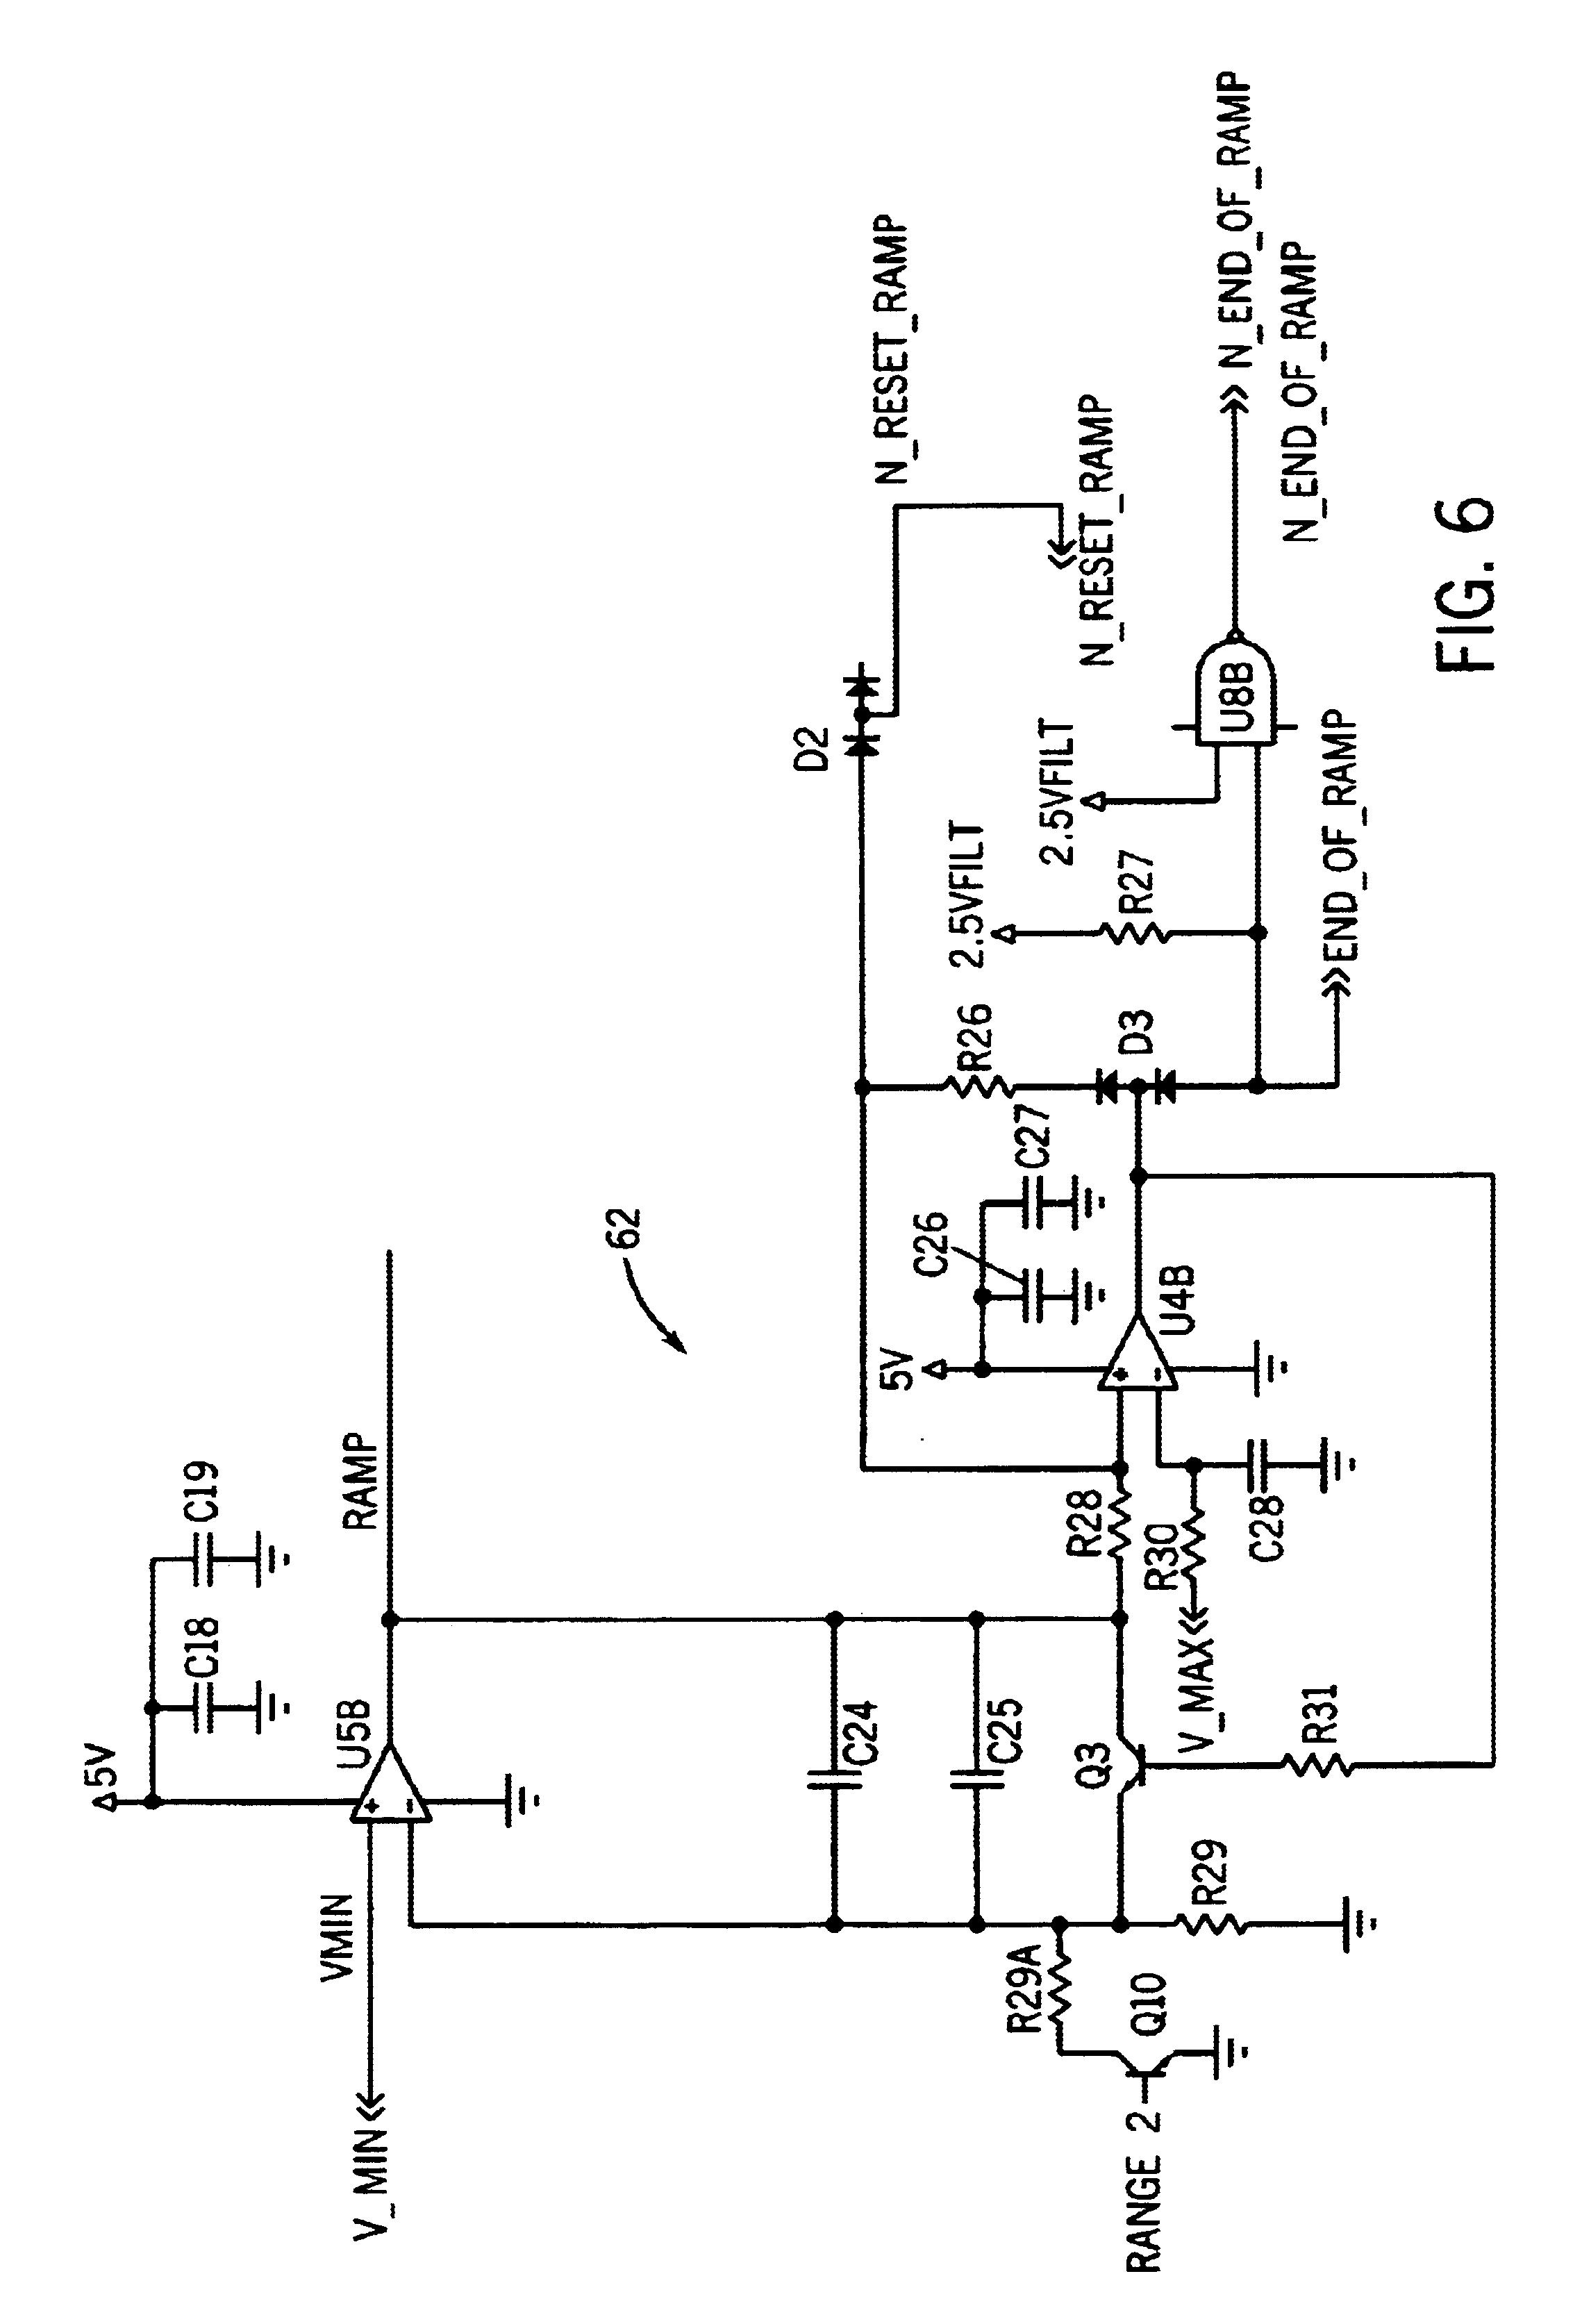 Rosemount Wireless Pressure Transmitter Manual Wiring Diagram 3095 Multivariable With